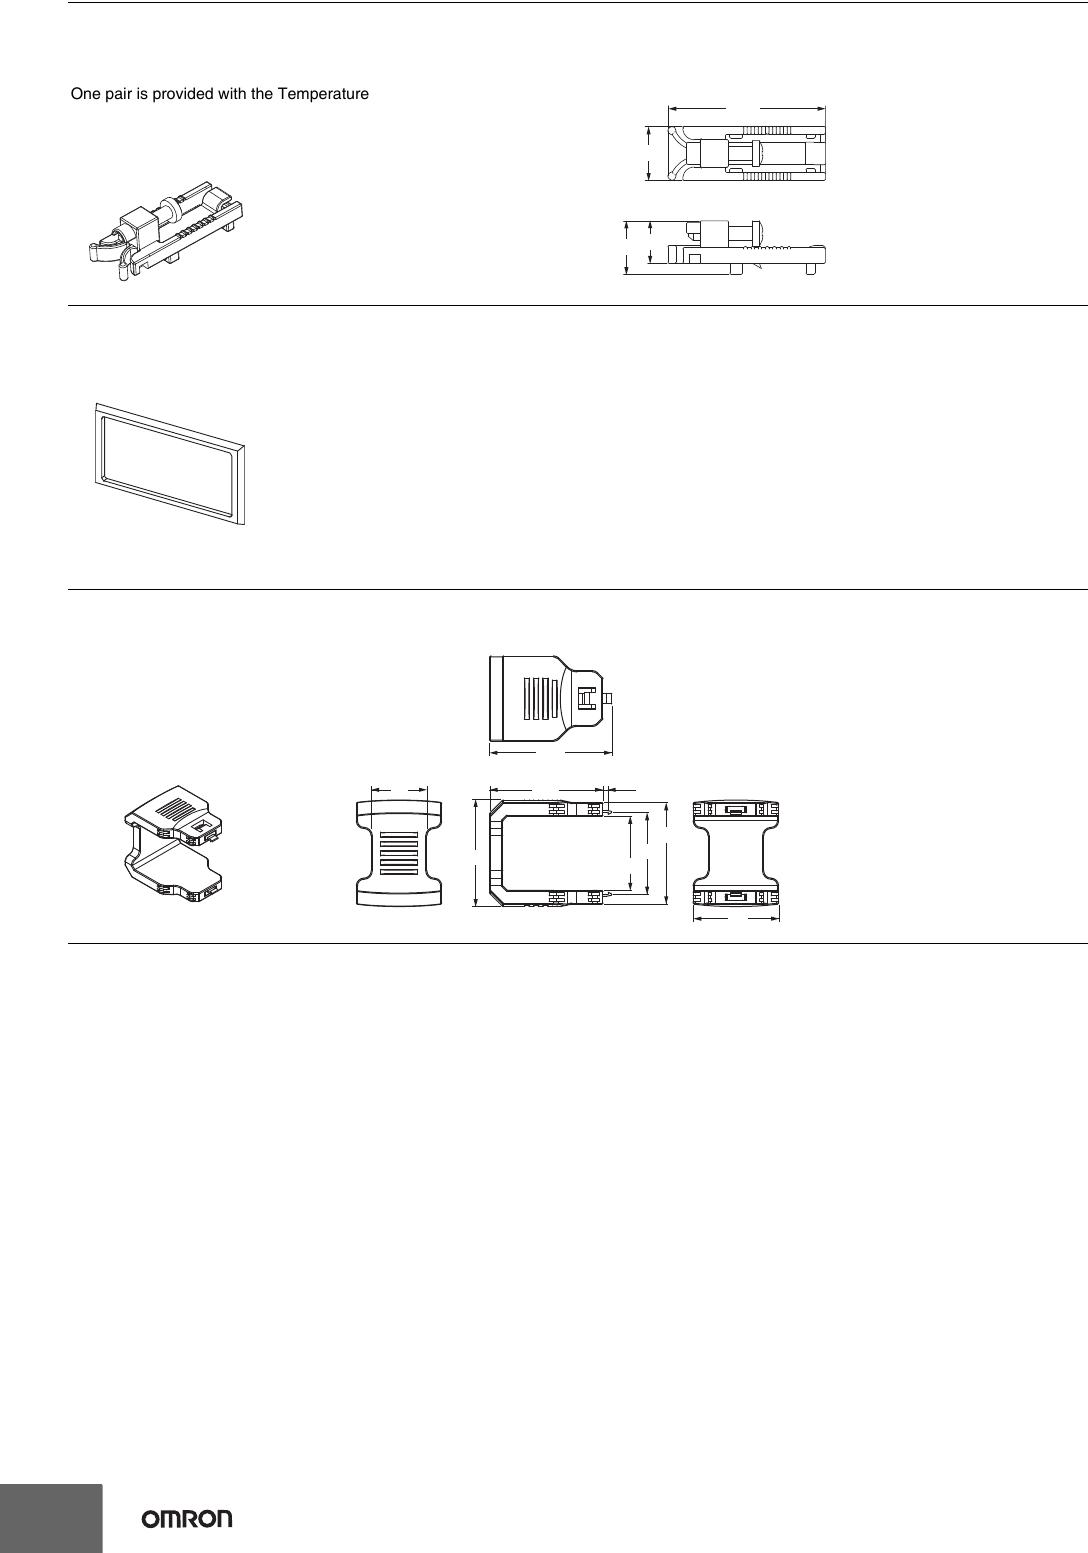 omron temperature controller wiring diagram plasma membrane worksheet e5xc t datasheet digikey e5gc